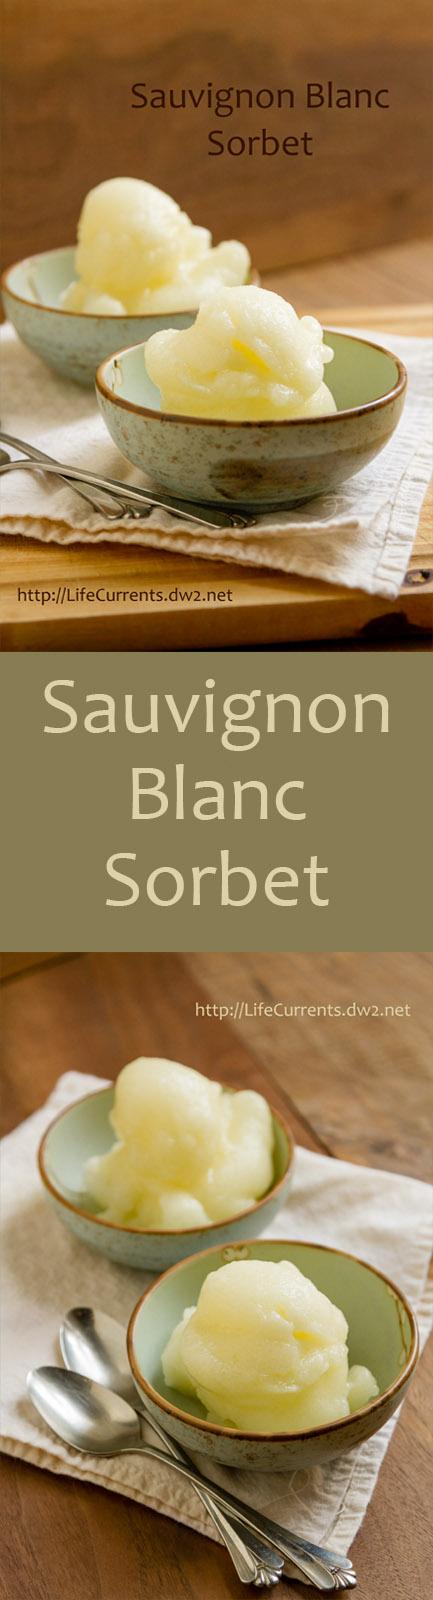 Long pin for Pinteerst for Sauvignon Blanc Sorbet Recipe